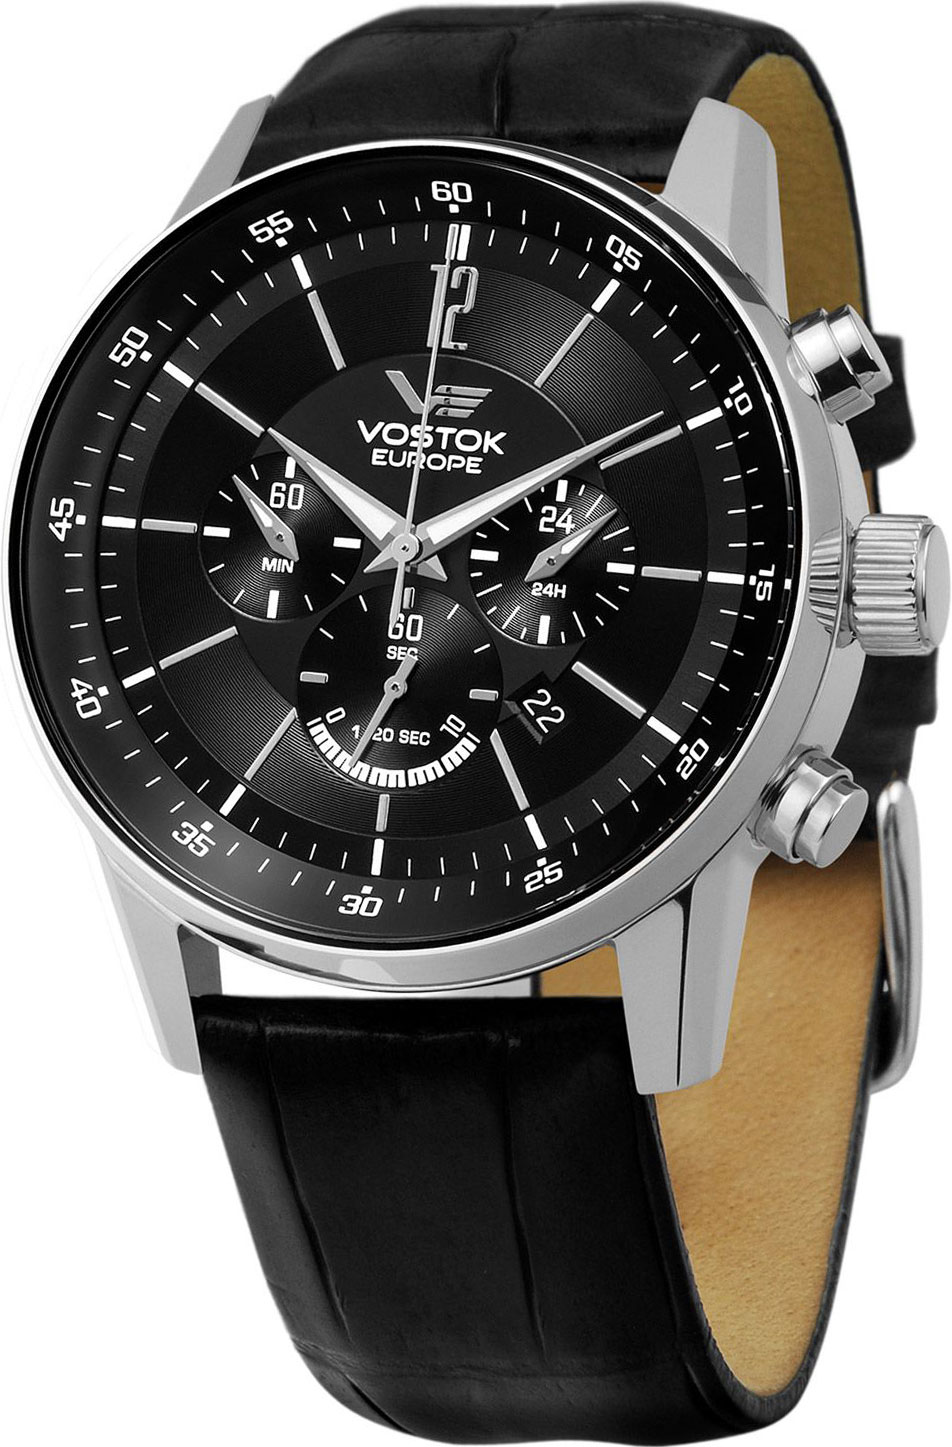 Мужские часы Vostok Europe OS22/5611297